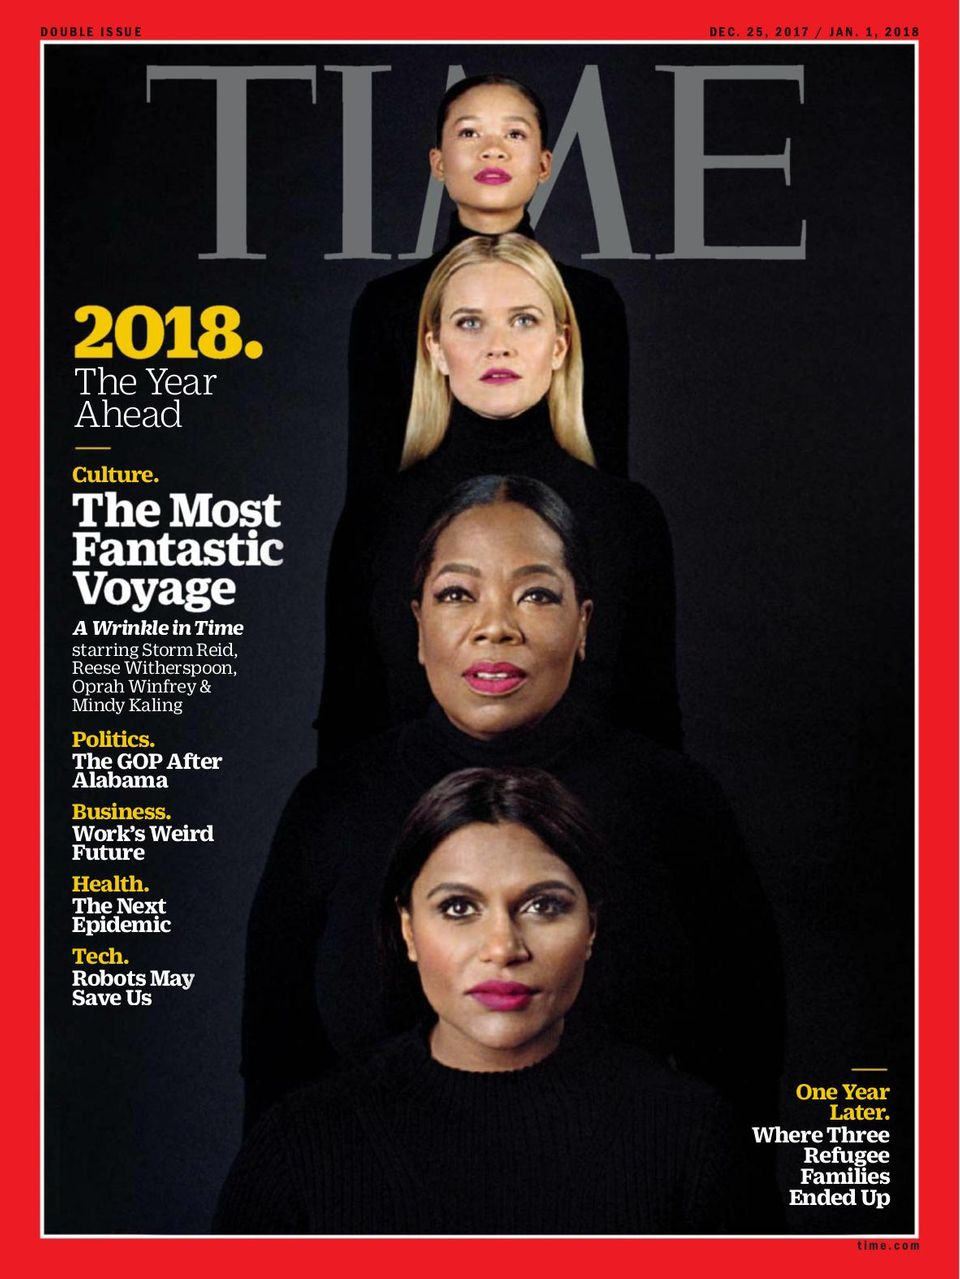 Time December 25, 2017